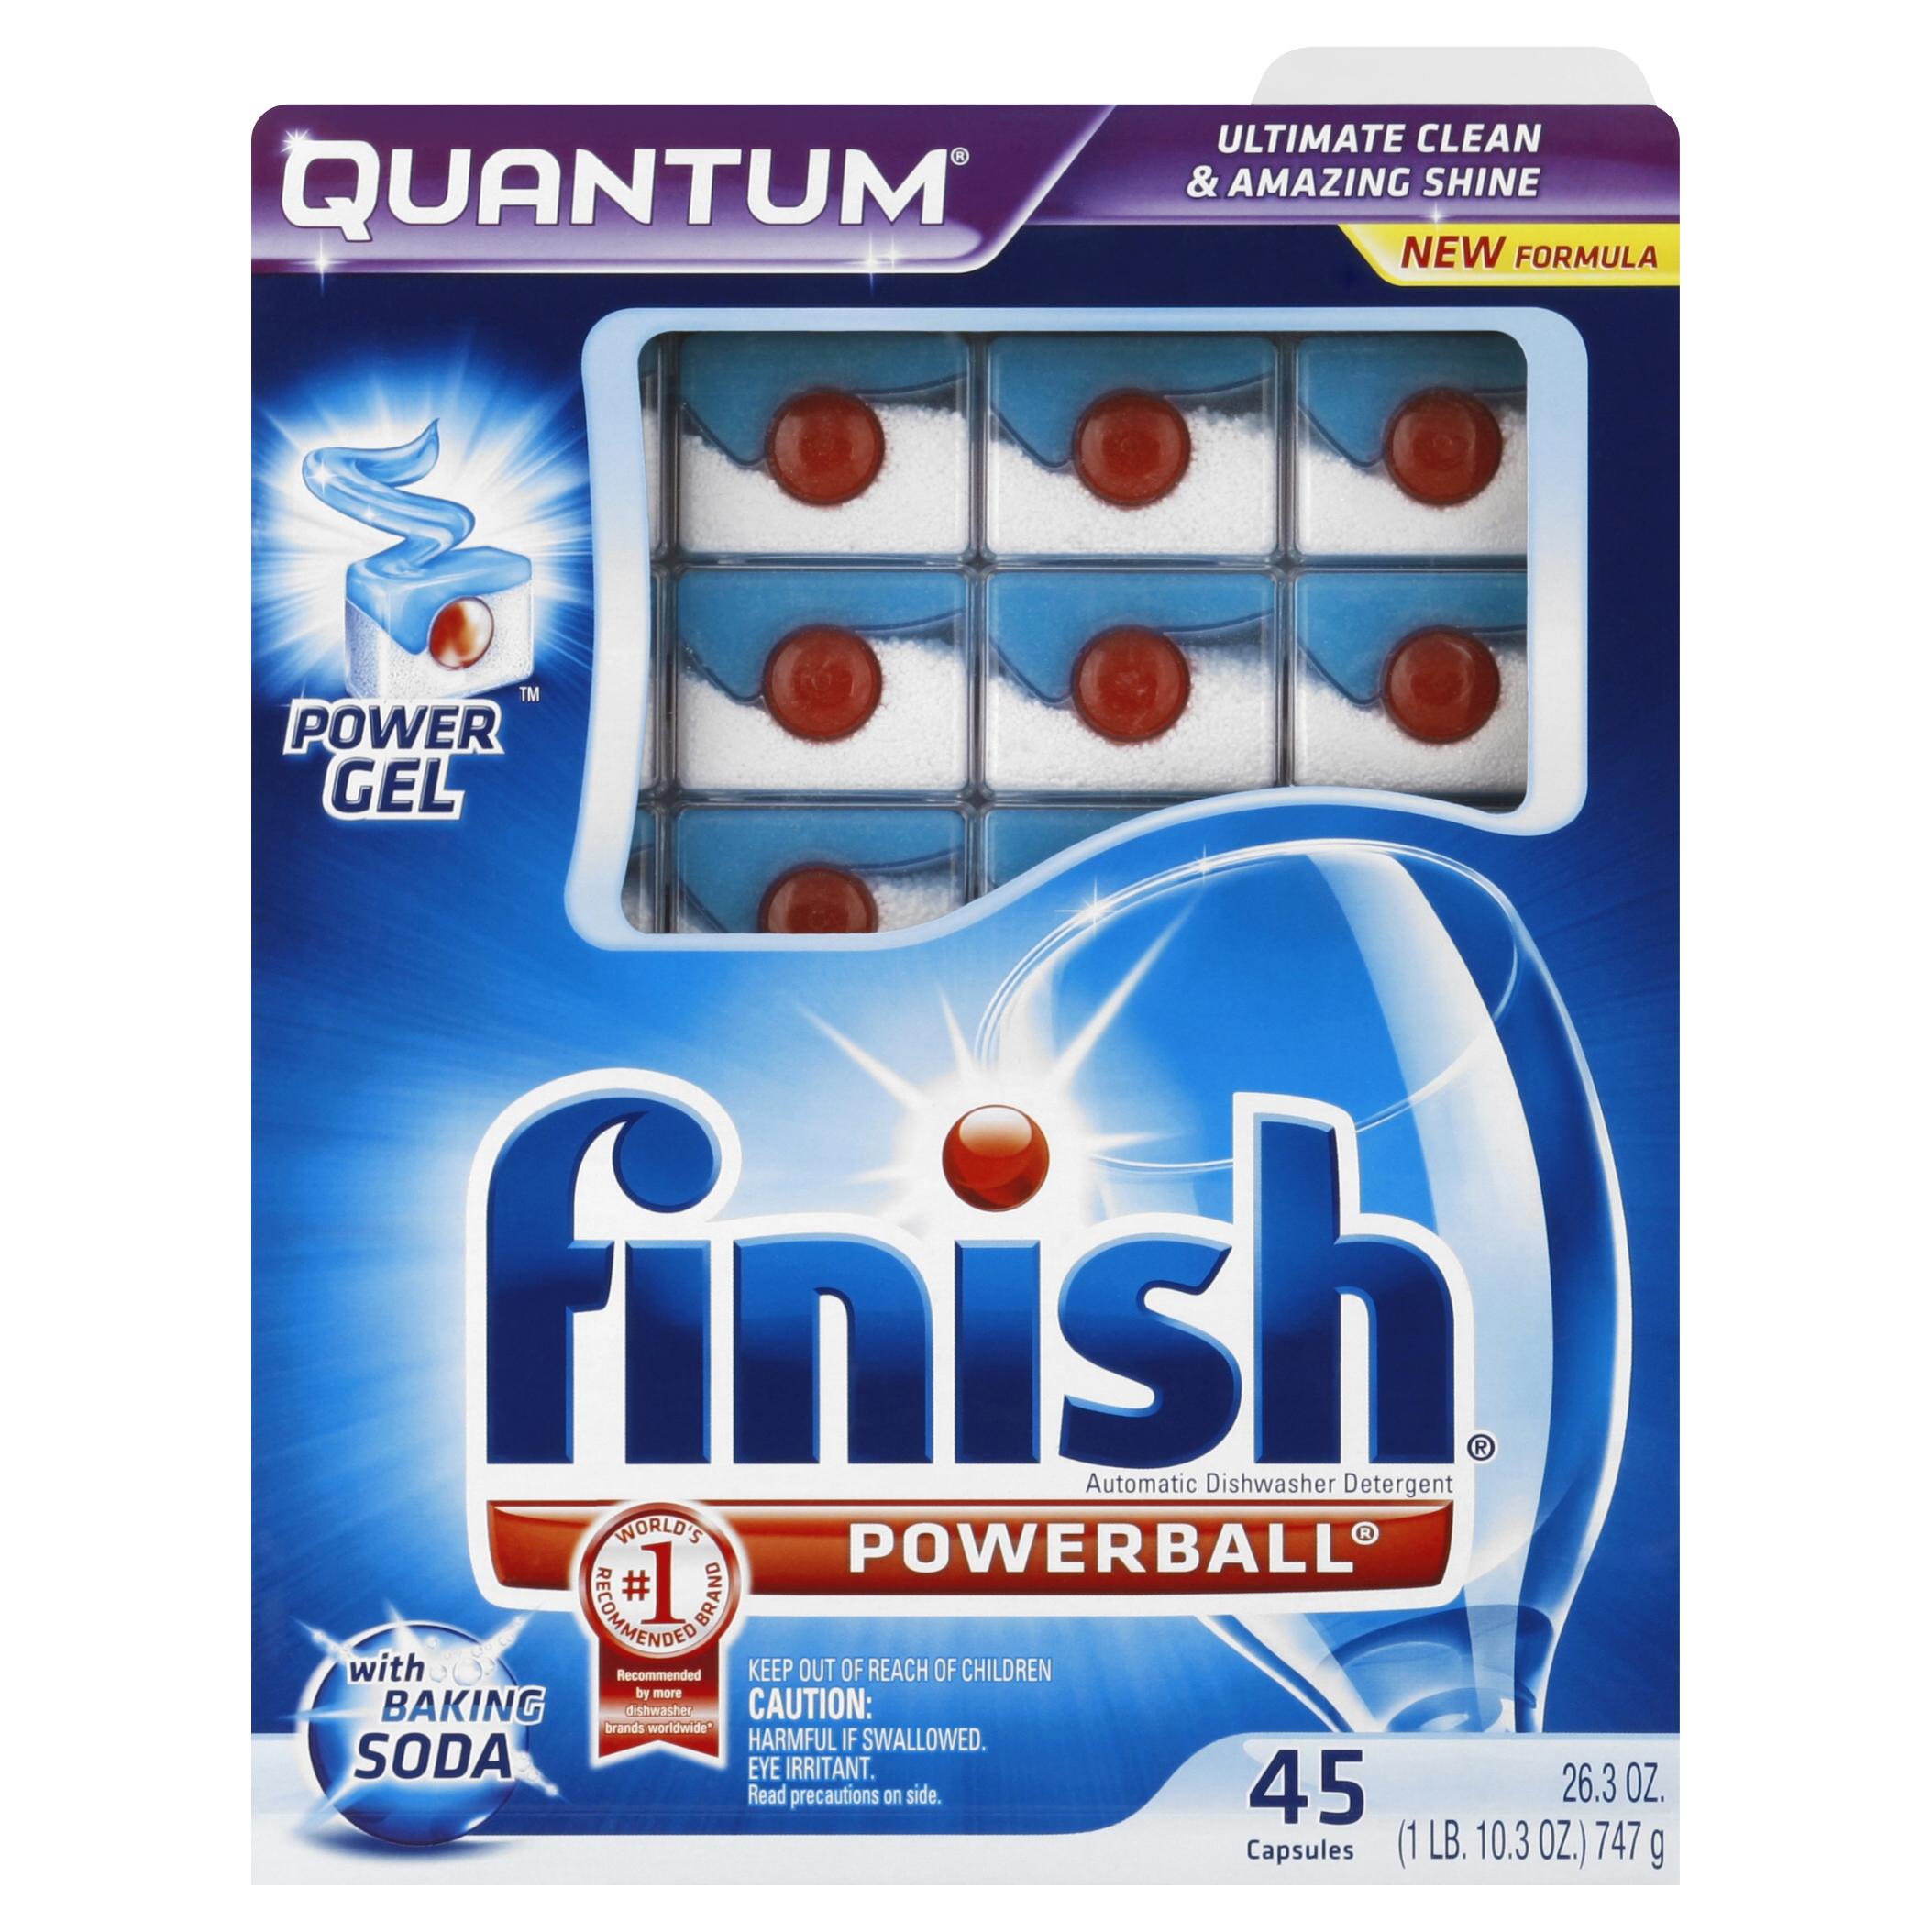 Finish Quantum Dishwasher Detergent with Baking Soda, 45 Count